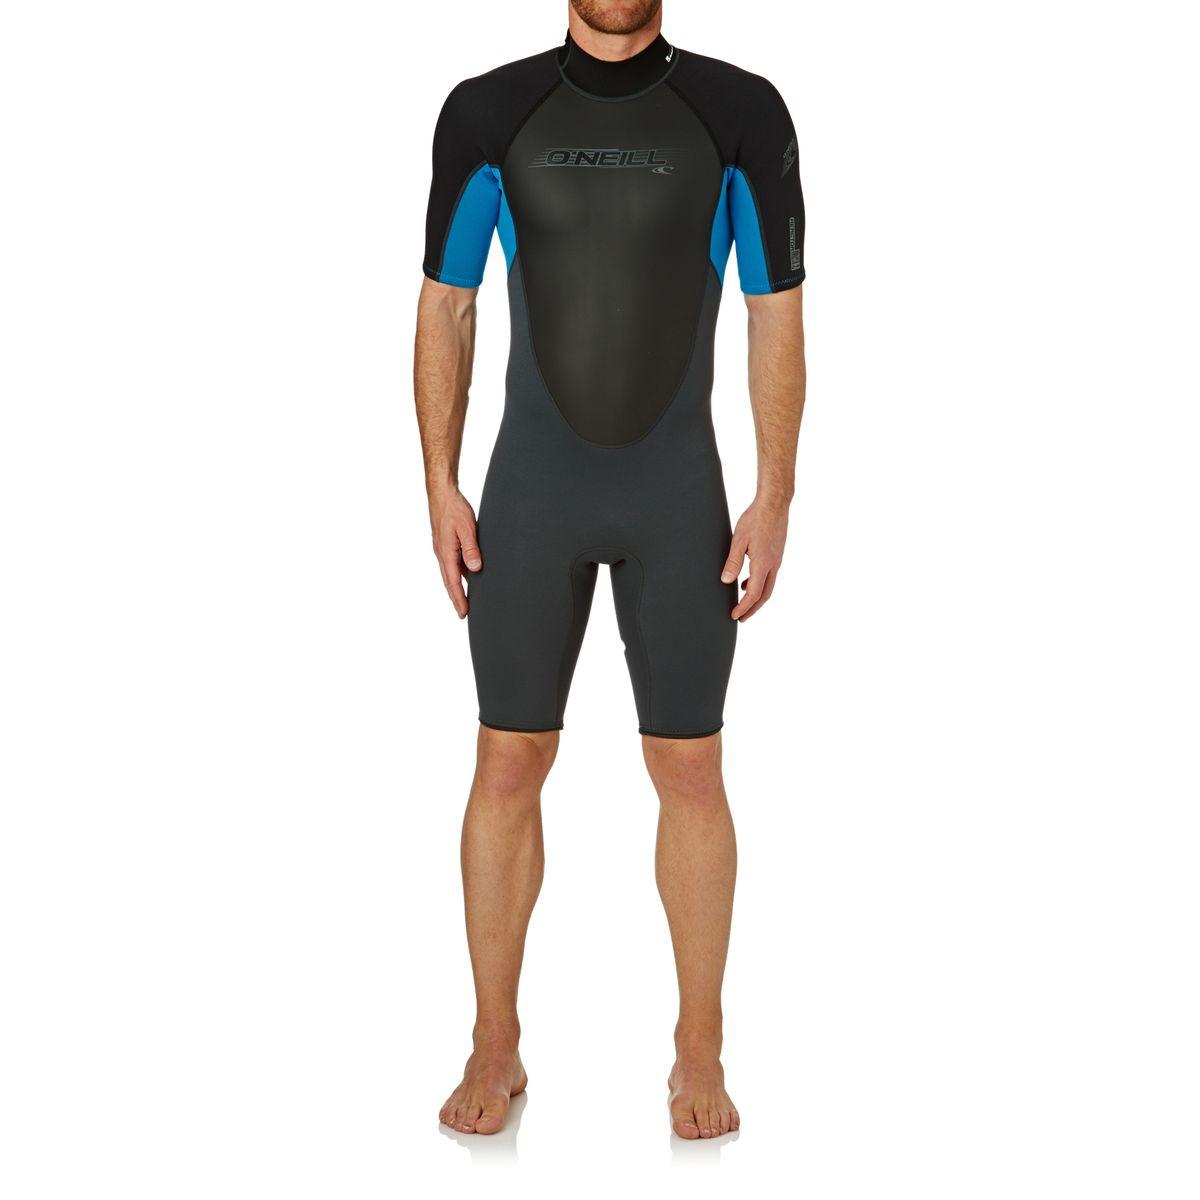 O'Neill Reactor 2mm Short Sleeve Shorty Wetsuit - Graphite/ Tahiti/ Black